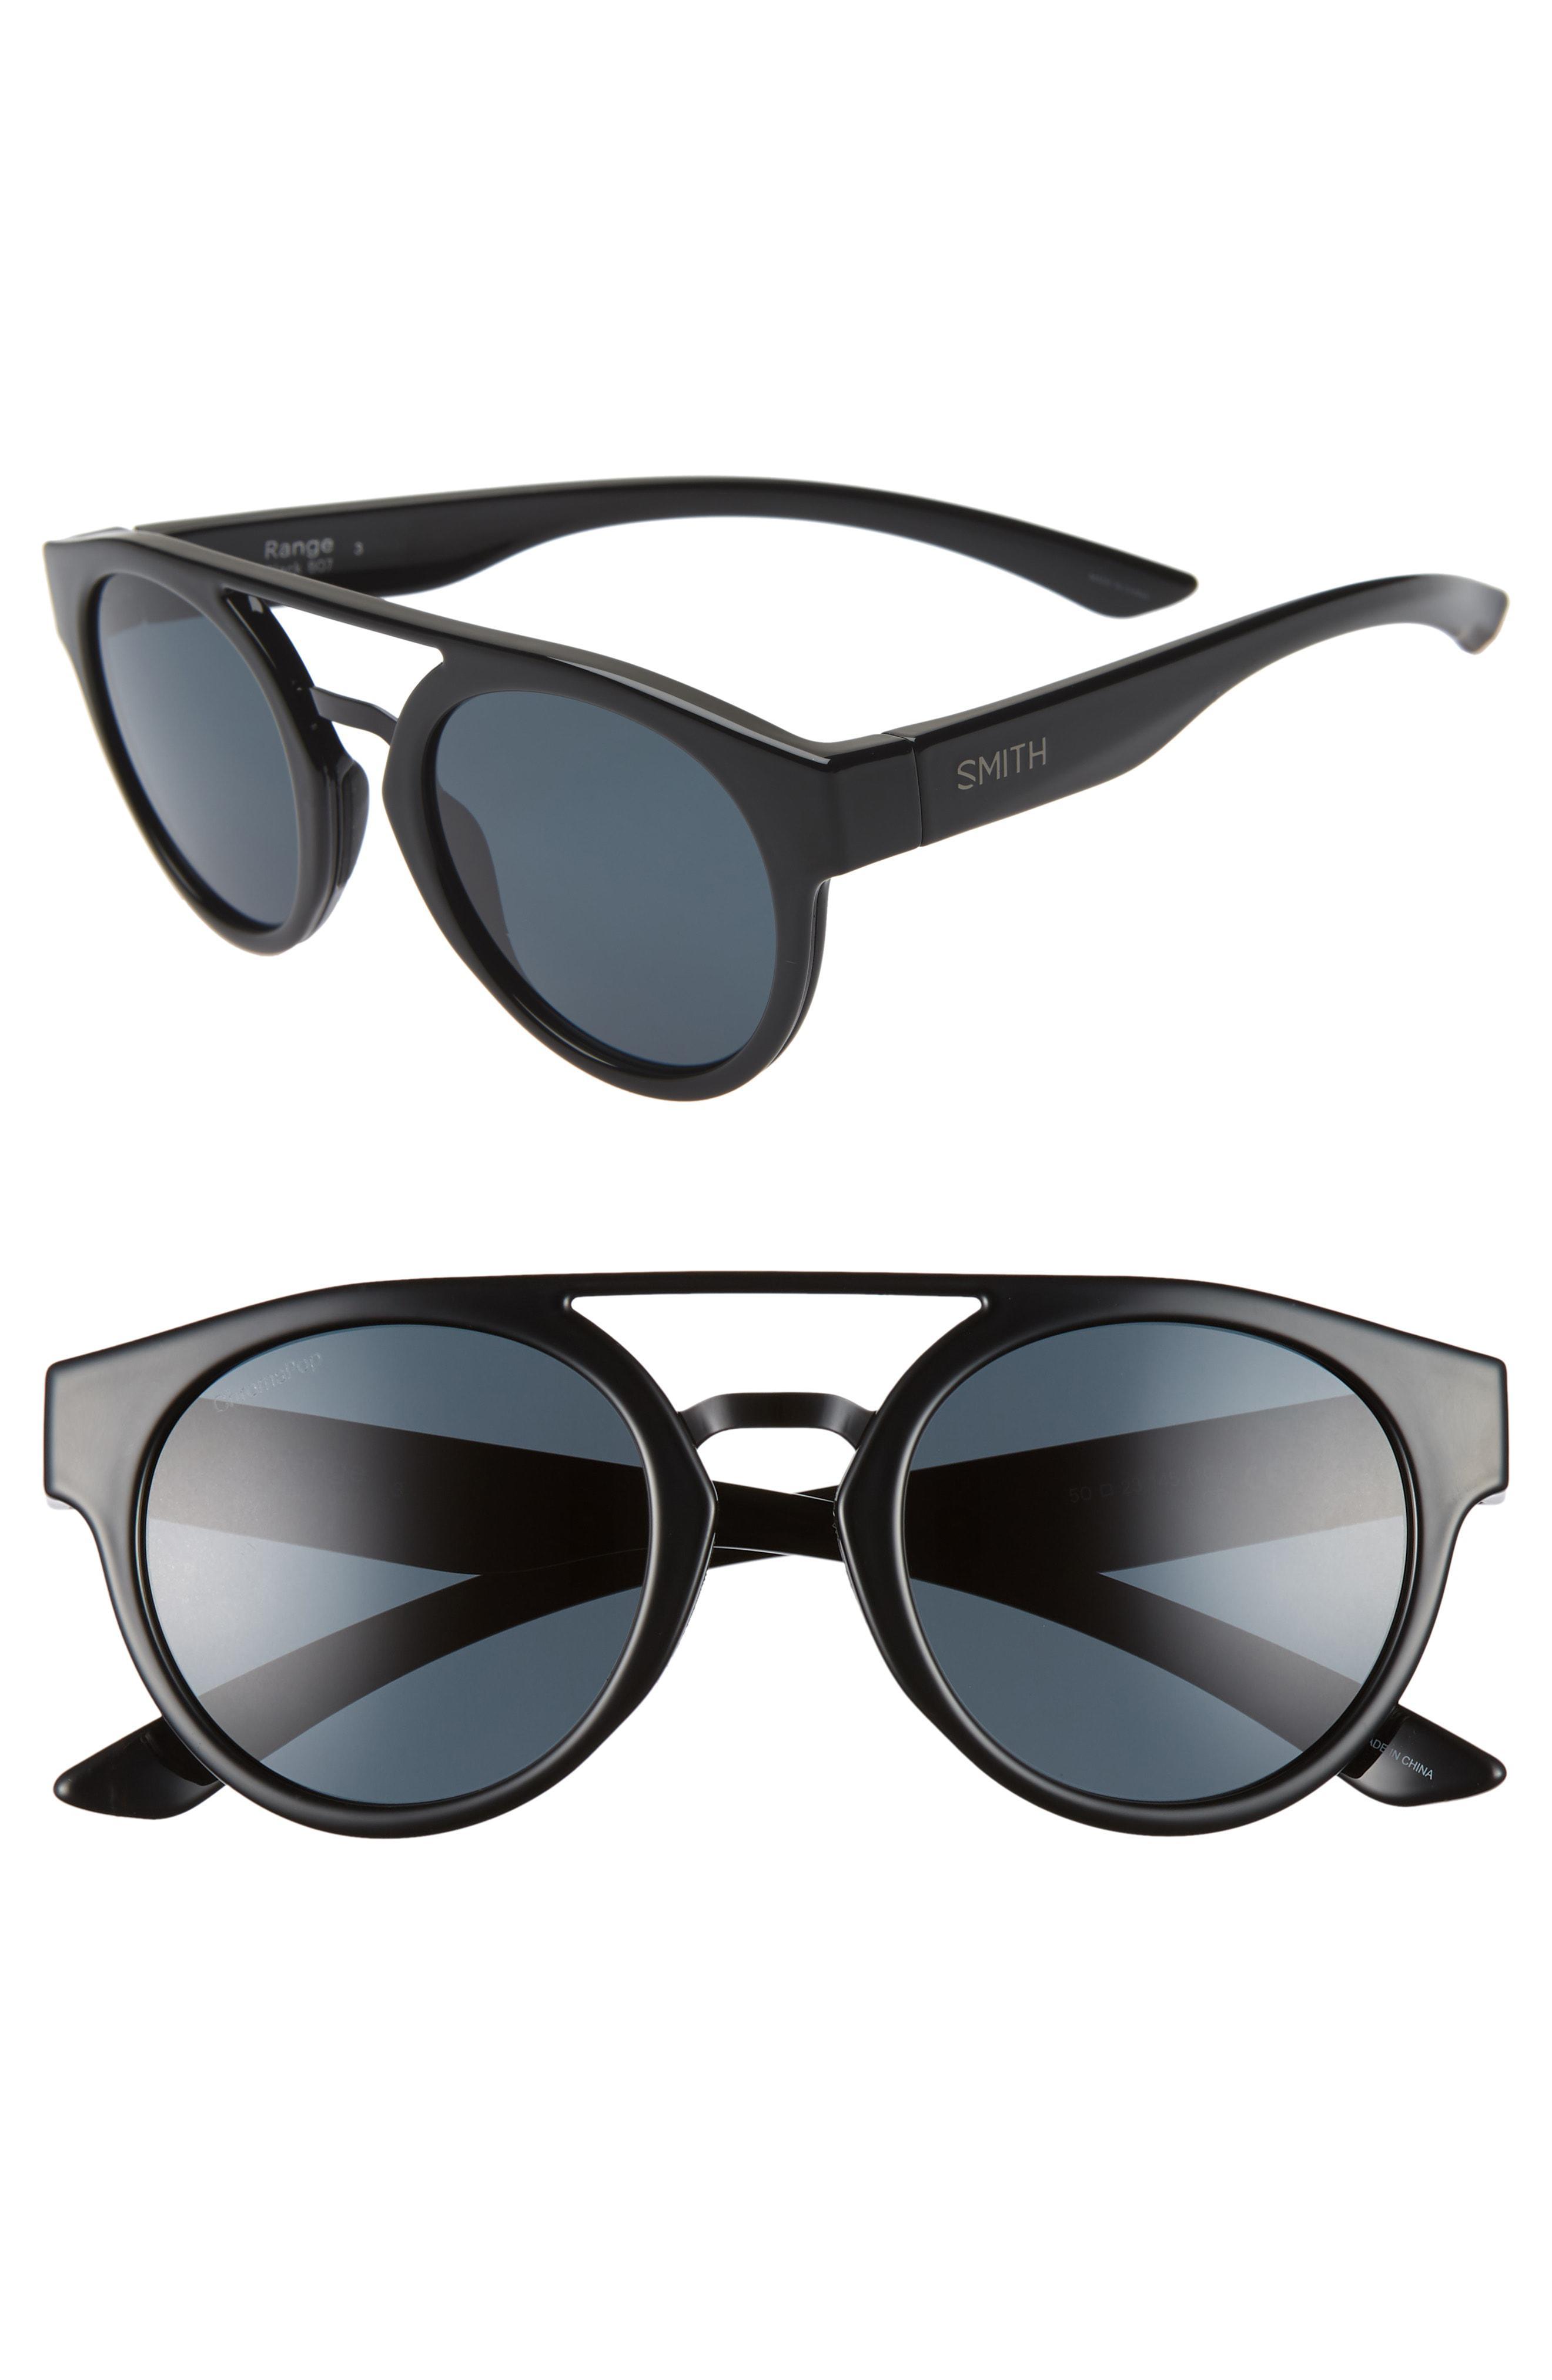 19a81d7da91 Smith - Range 50mm Chromapop(tm) Polarized Sunglasses - Chocolate Tortoise   Blue -. View fullscreen